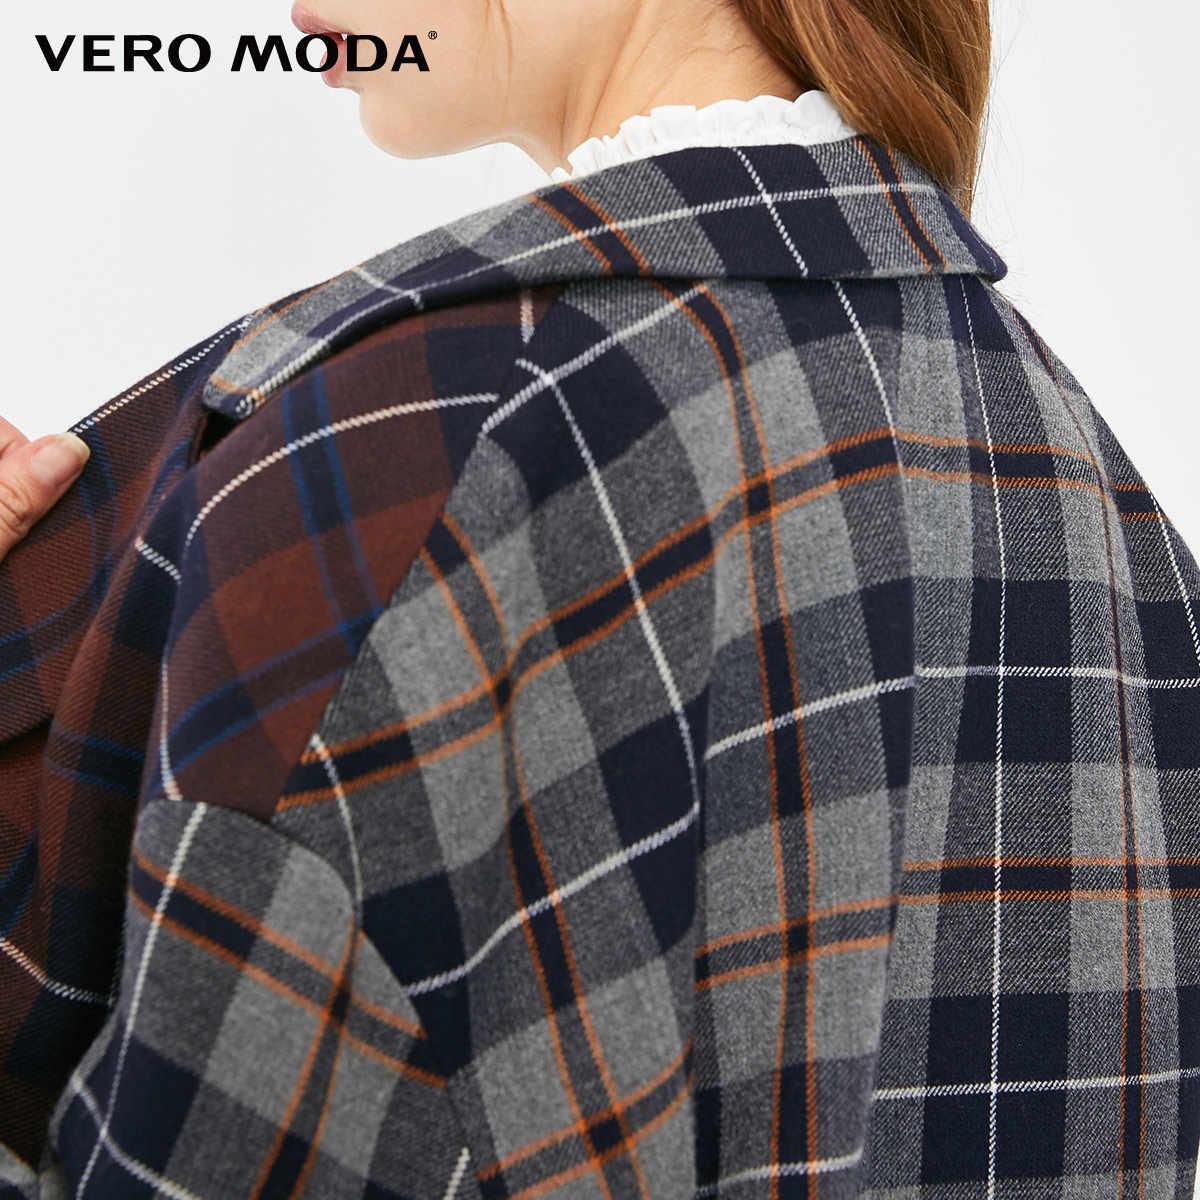 Vero Moda Herfst En Winter Kleur Bijpassende Revers Kraag Check Blazer | 319108516